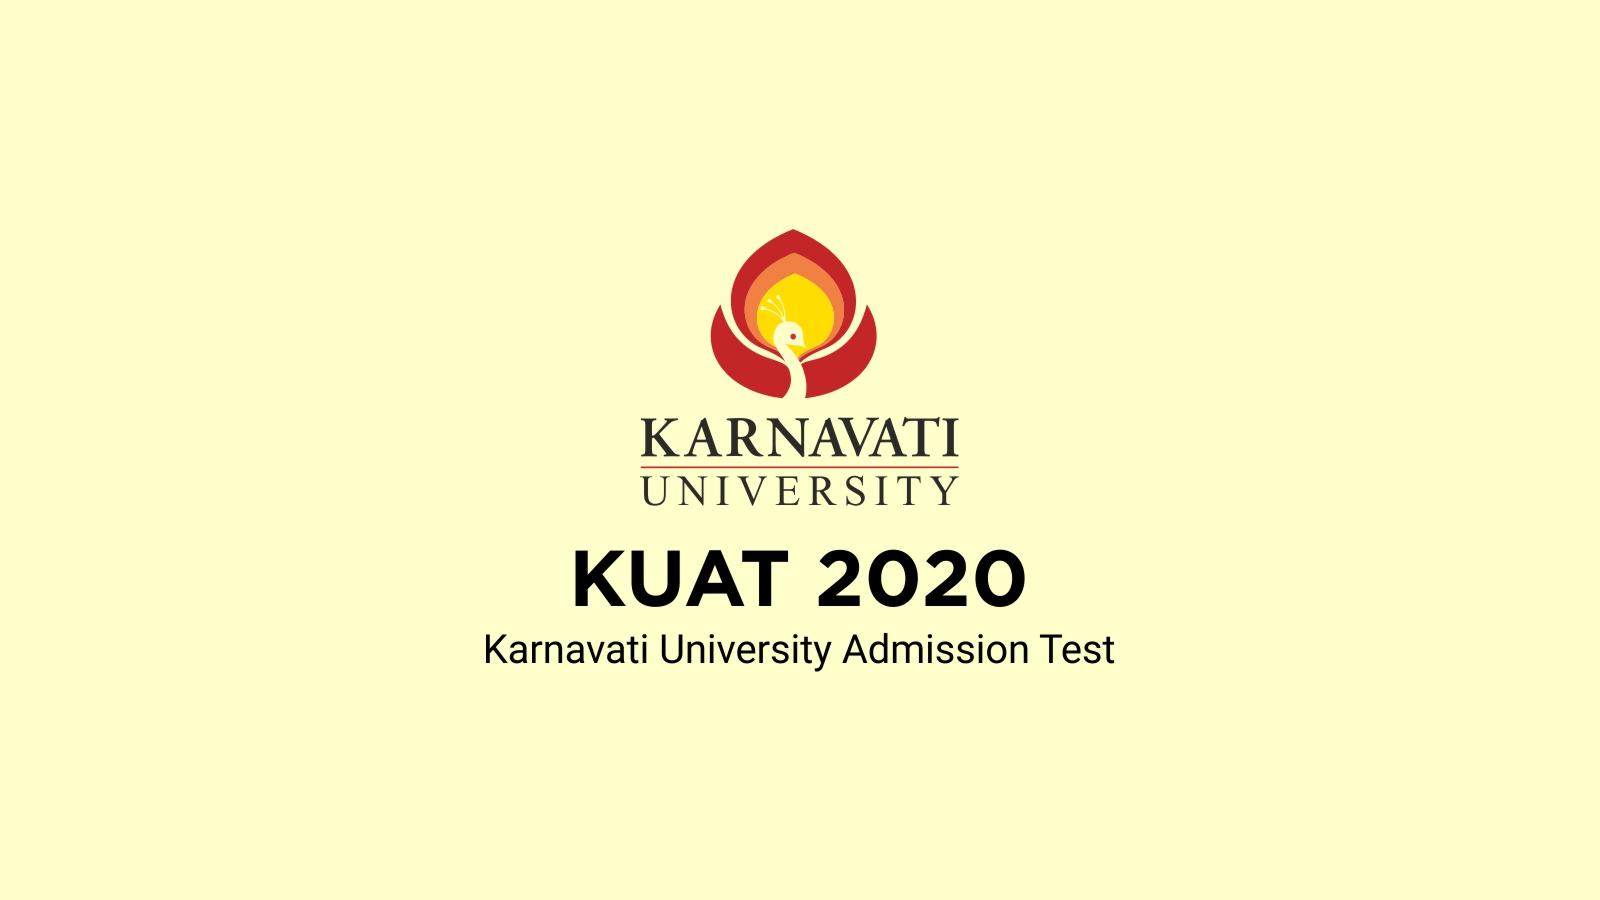 KUAT-2020 Image